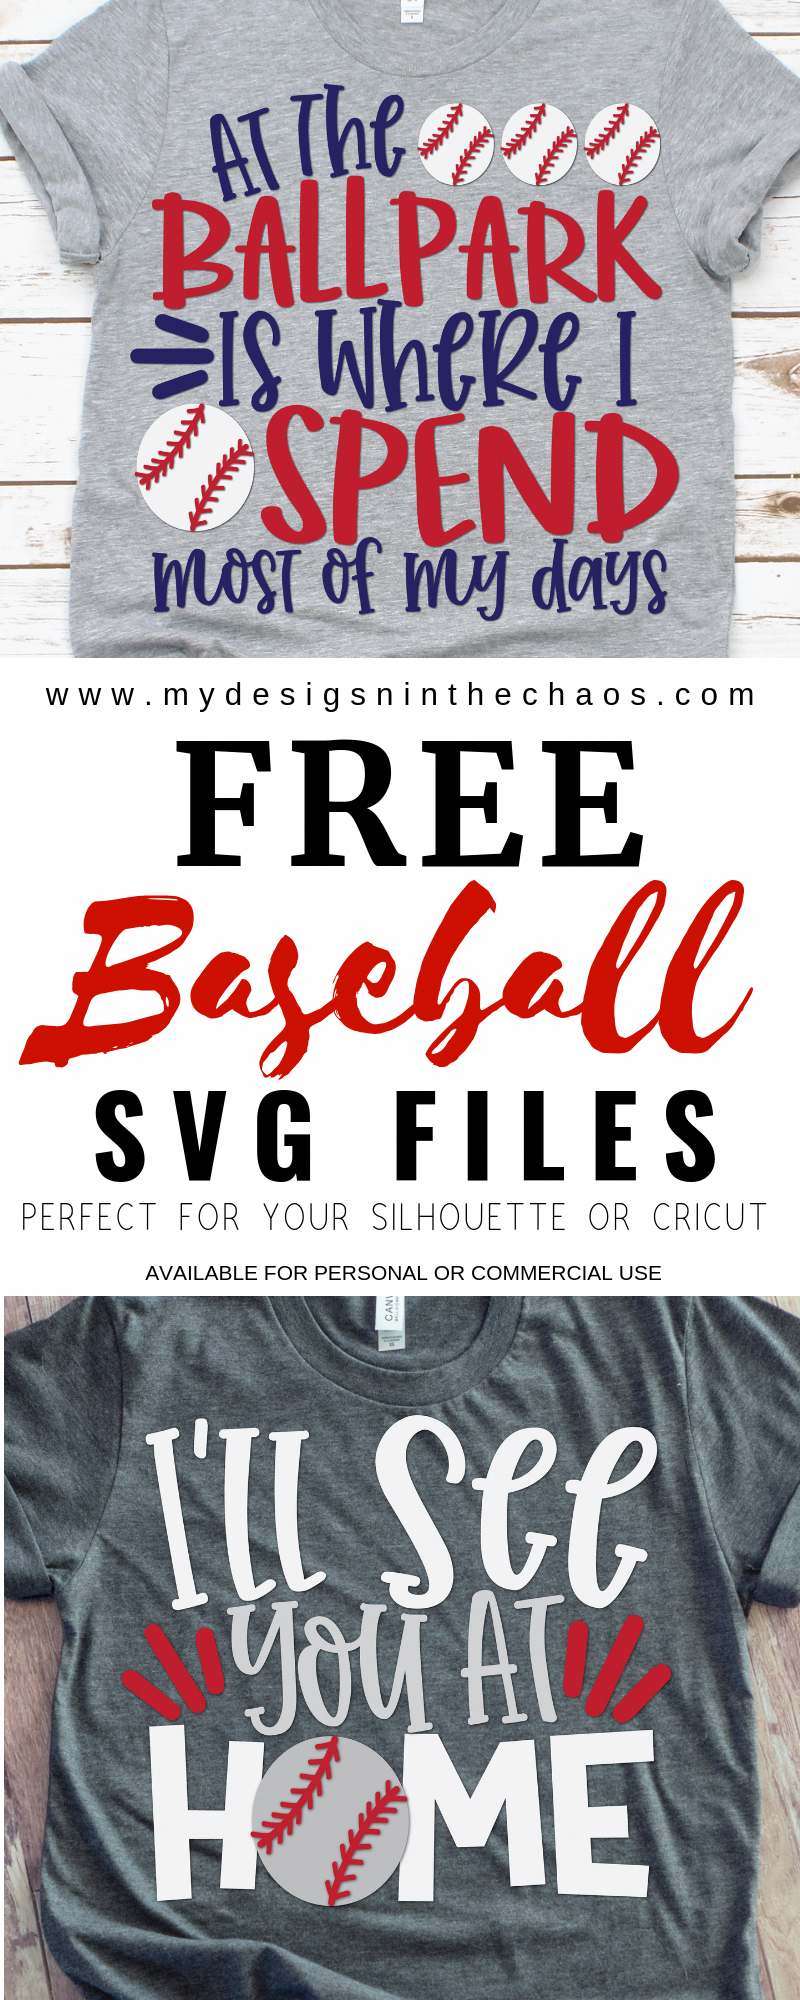 Free Baseball SVG Files for Silhouette or Cricut Cricut